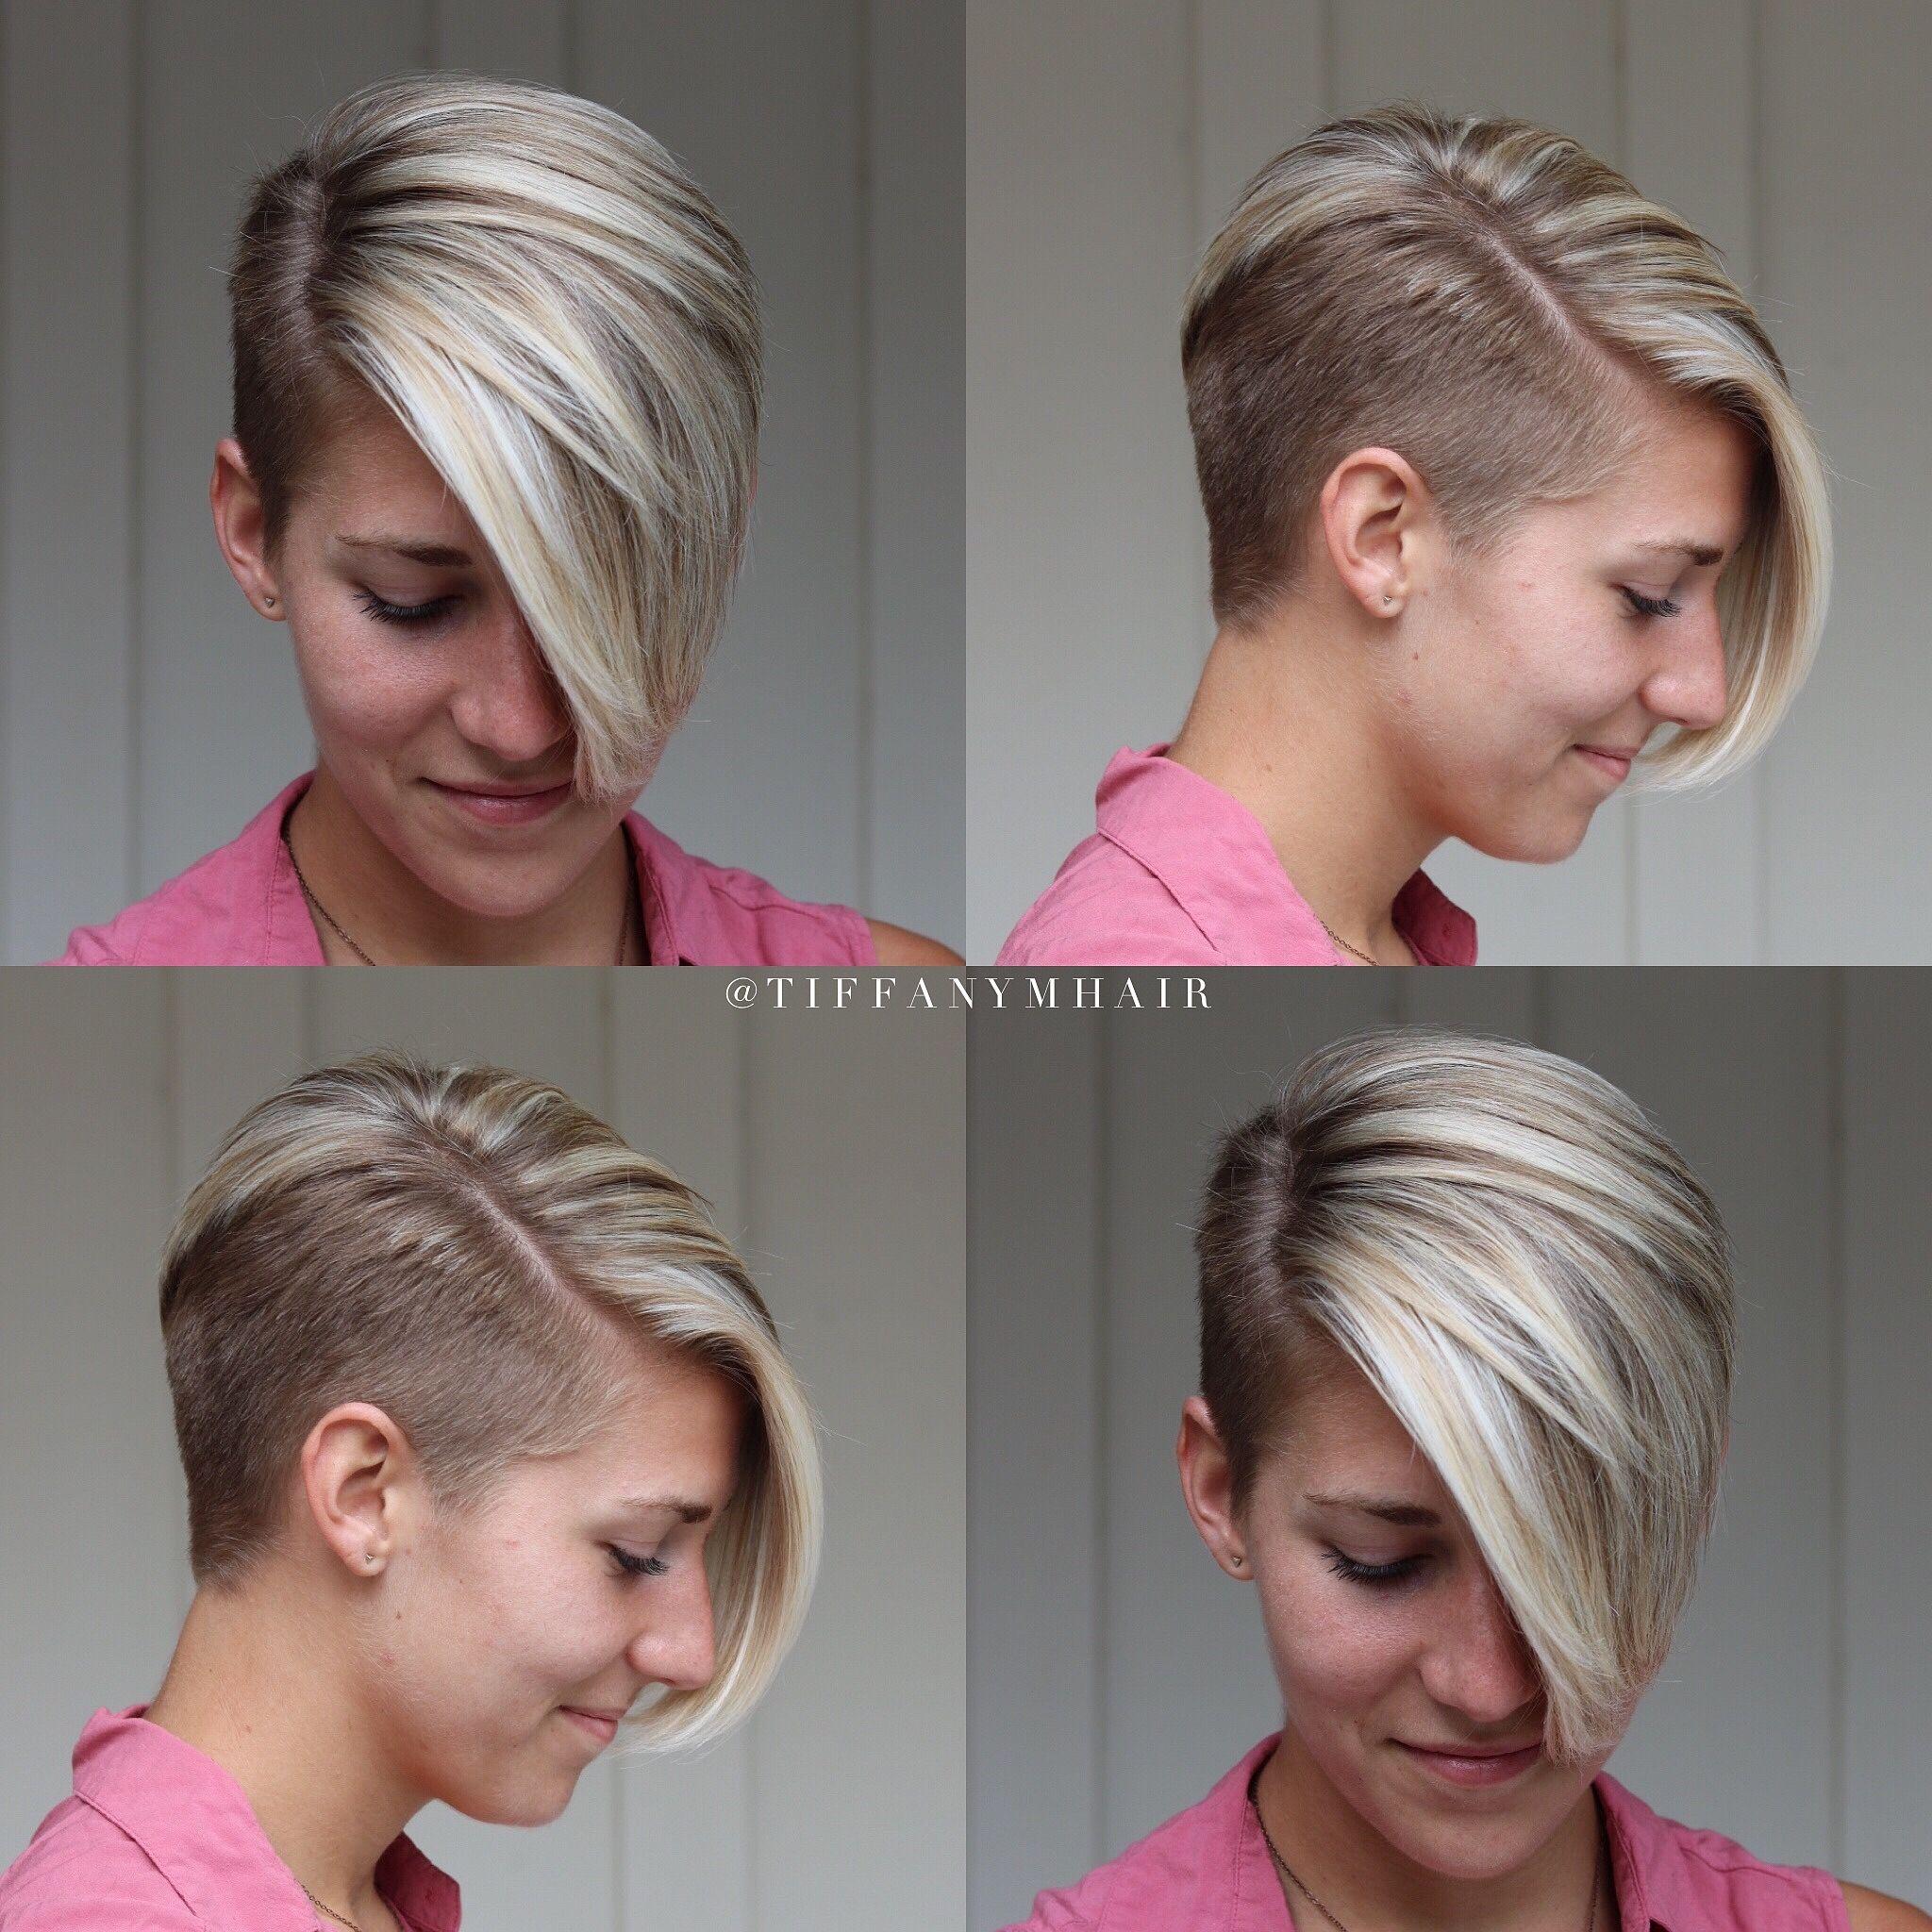 Short Side Shave Short Shaved Hairstyles Hair Styles Short Hair Undercut